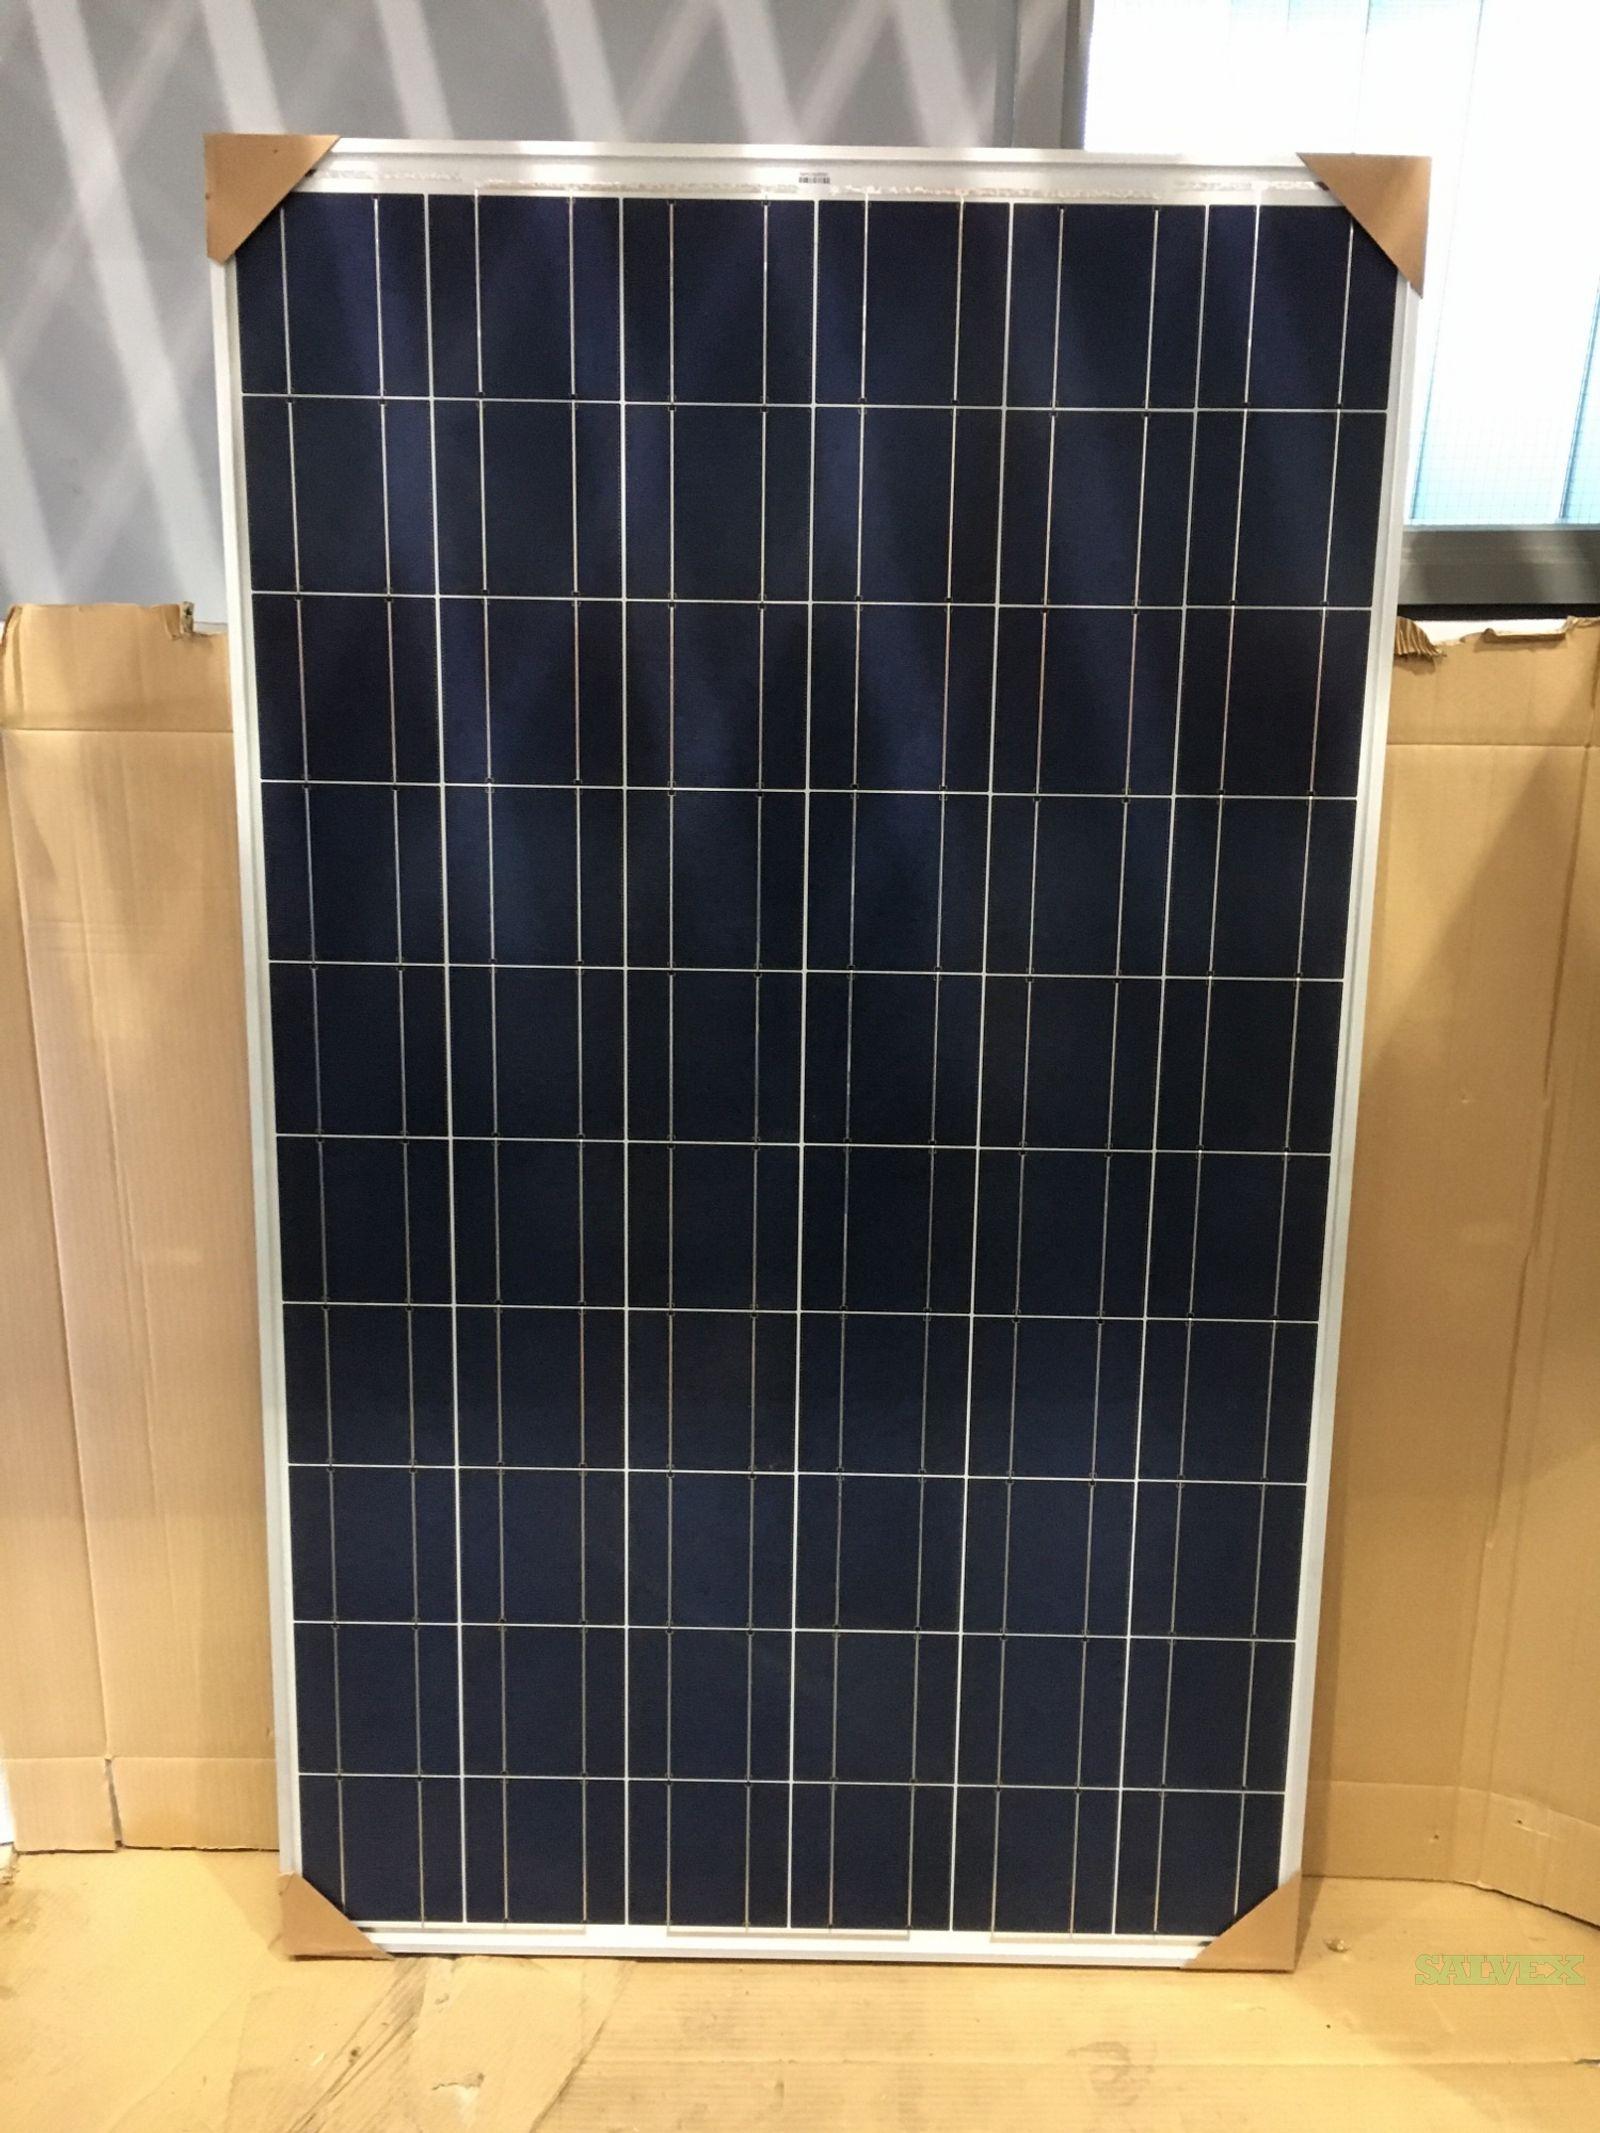 Yingli Solar YL240P-29b 240W Poly Module (1 module)